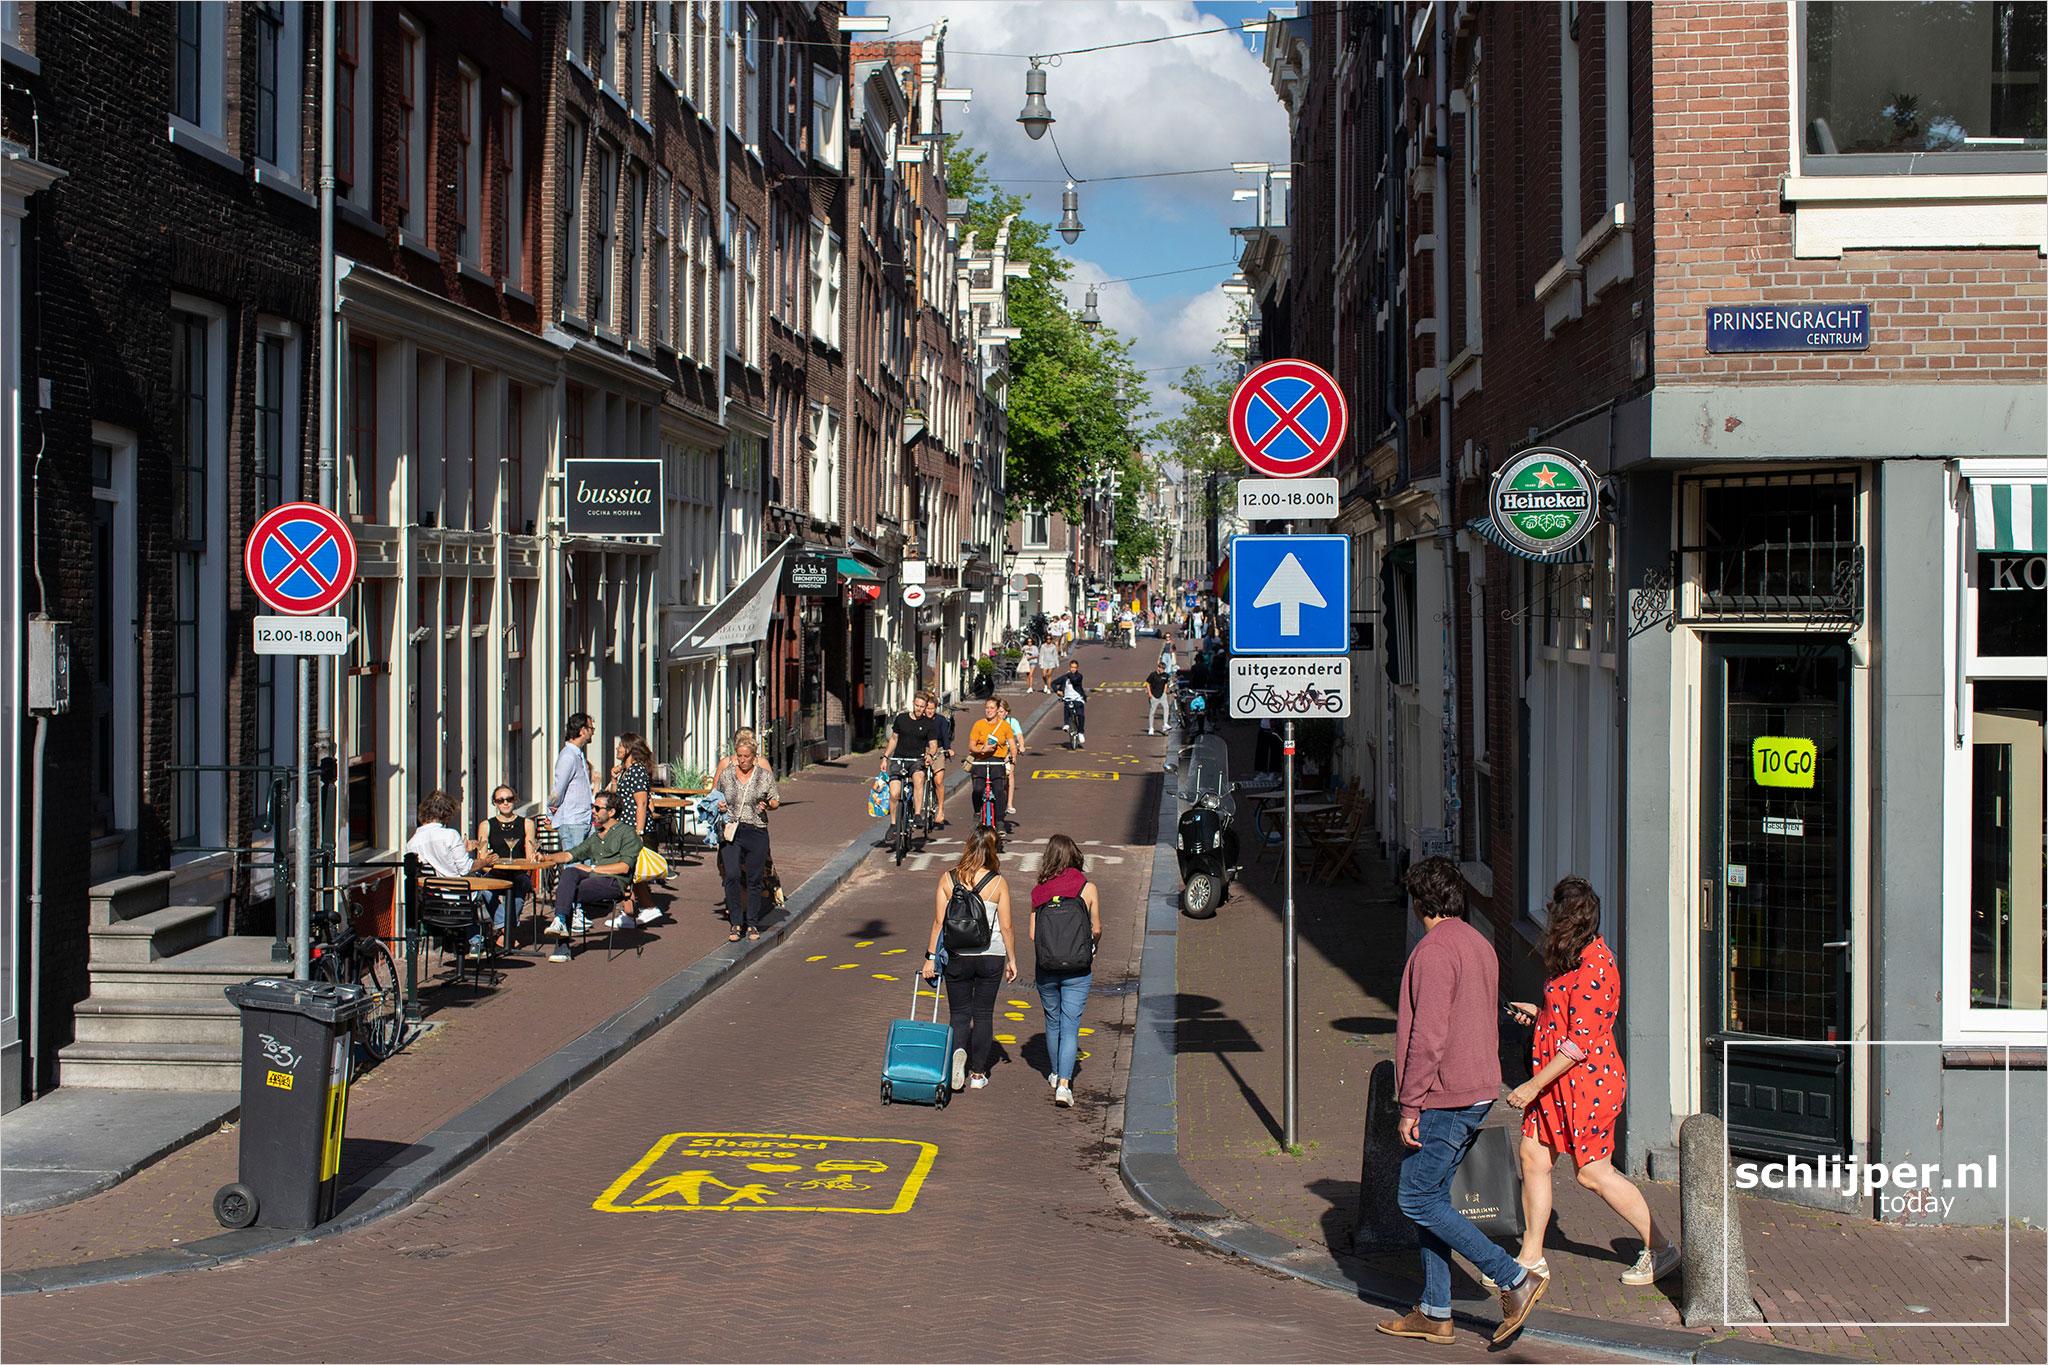 Nederland, Amsterdam, 27 juni 2020